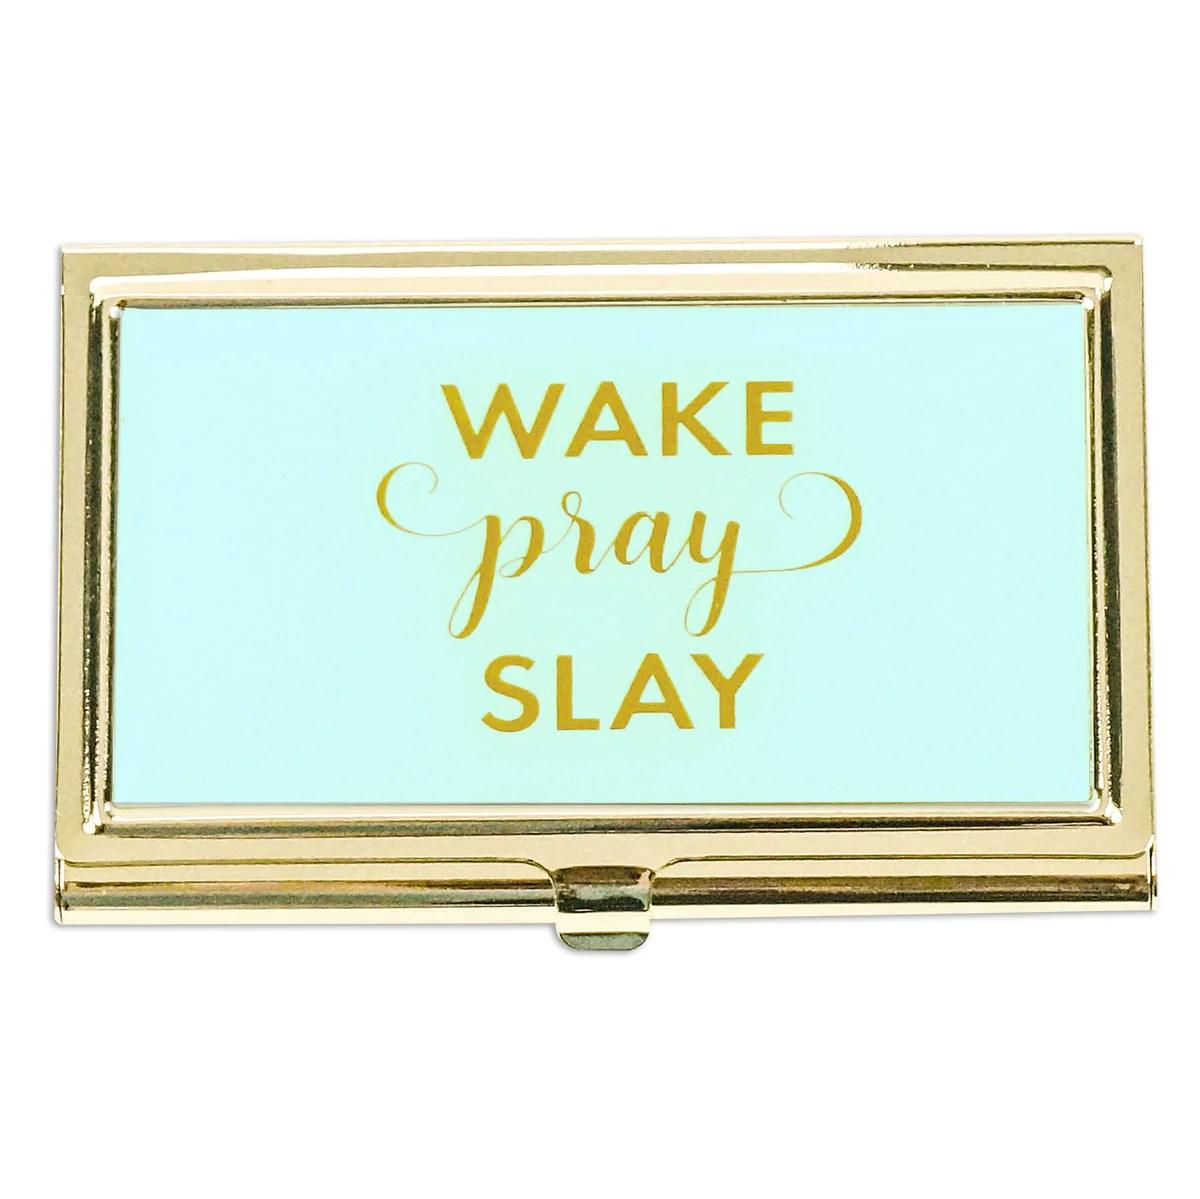 Impressive Business Card Her Wake Pray Slay Business Card Her Wake Pray Slay Mary Square Wake Pray Slay Planner Wake Pray Slay T Shirts inspiration Wake Pray Slay